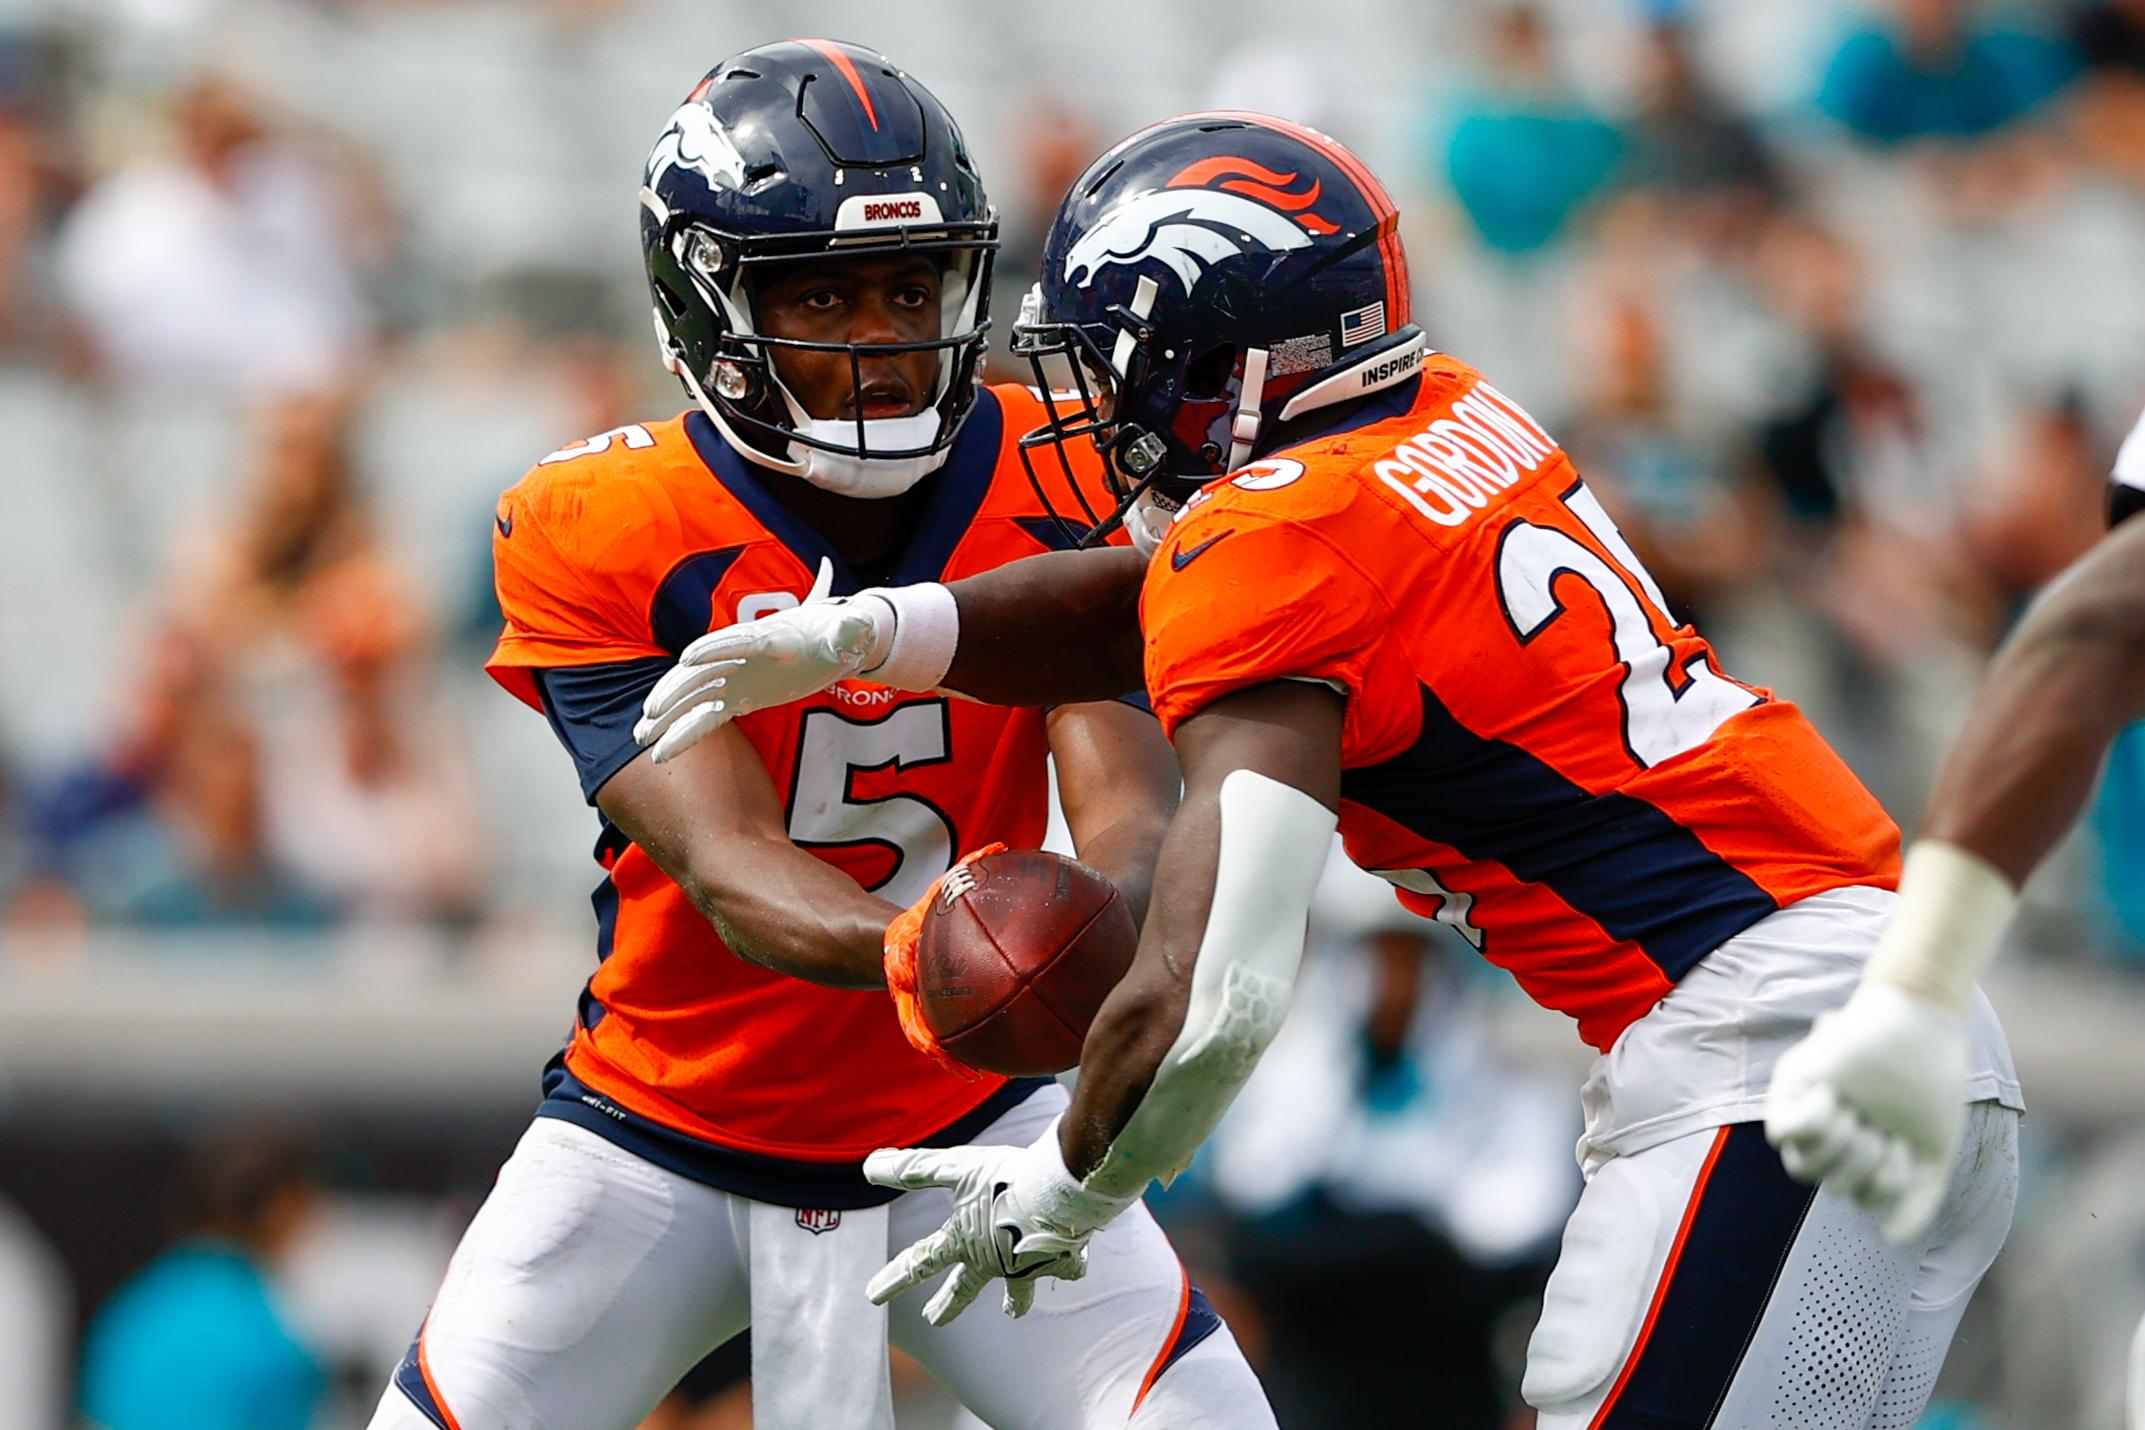 Denver Broncos quarterback Teddy Bridgewater (5) hands off to running back Melvin Gordon (25) in the fourth quarter at TIAA Bank Field.